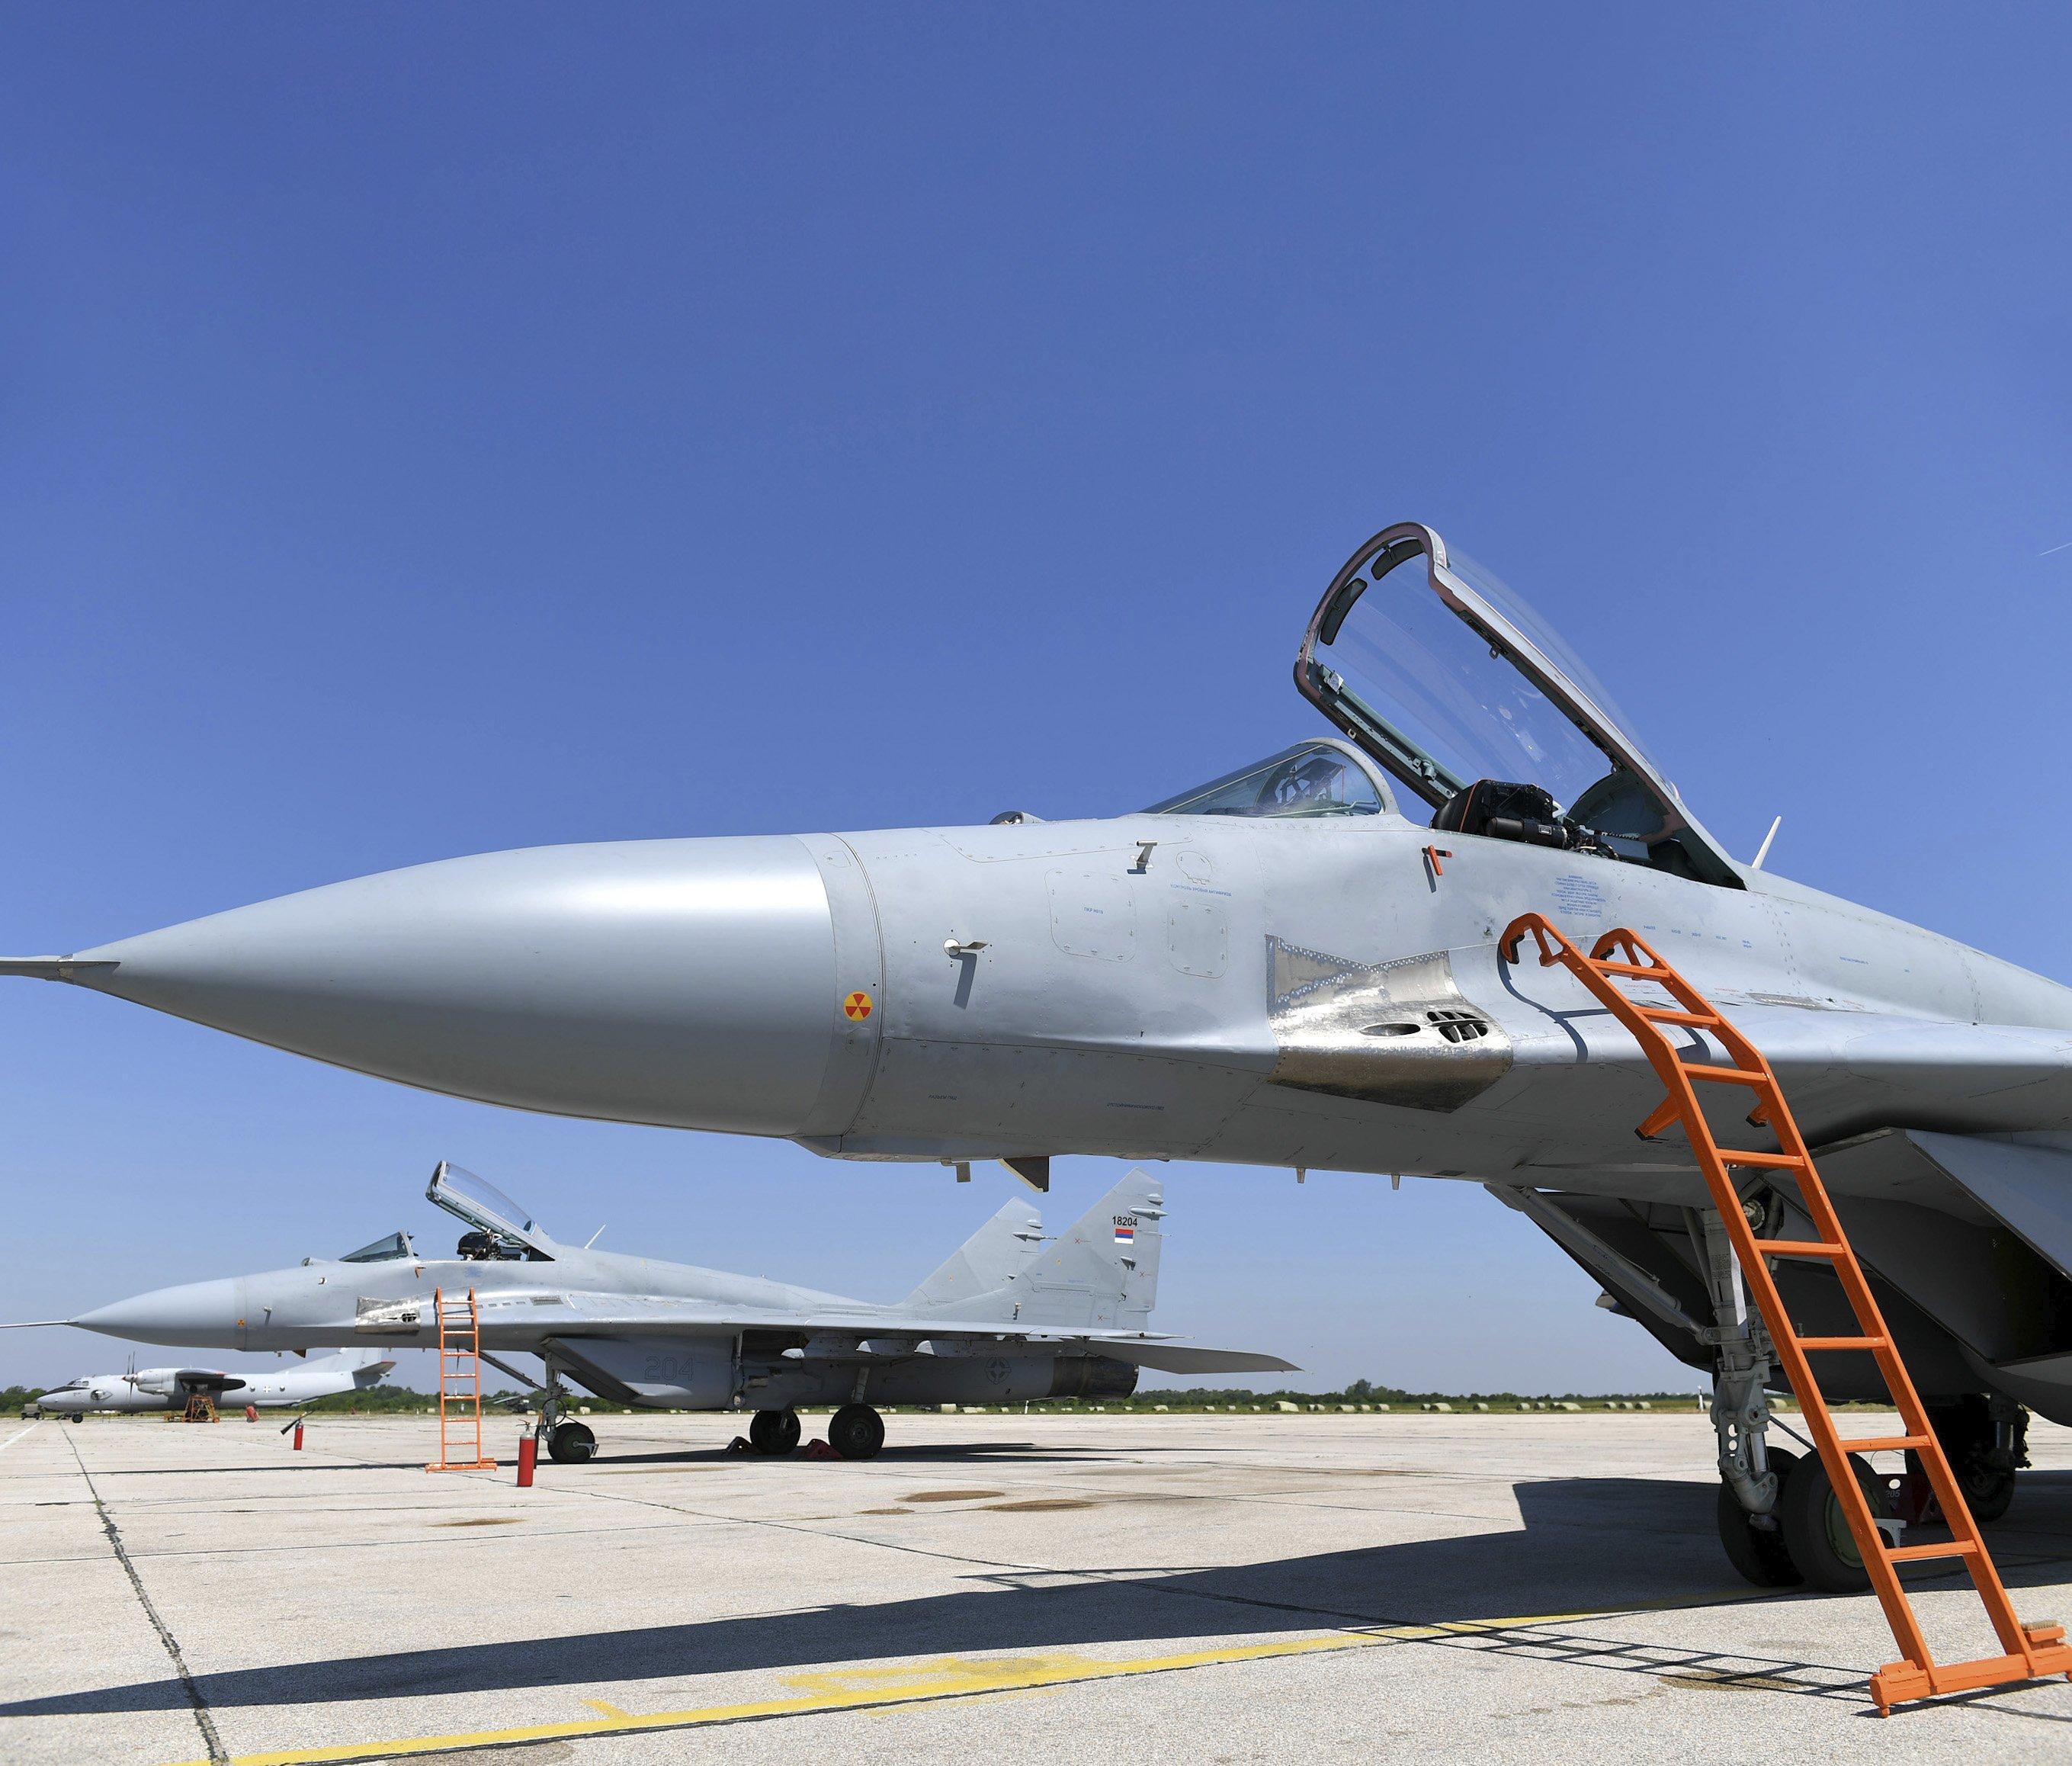 Serbia receives four MiG-29 Fulcrum-Cs from Belarus [Serbian MOD]